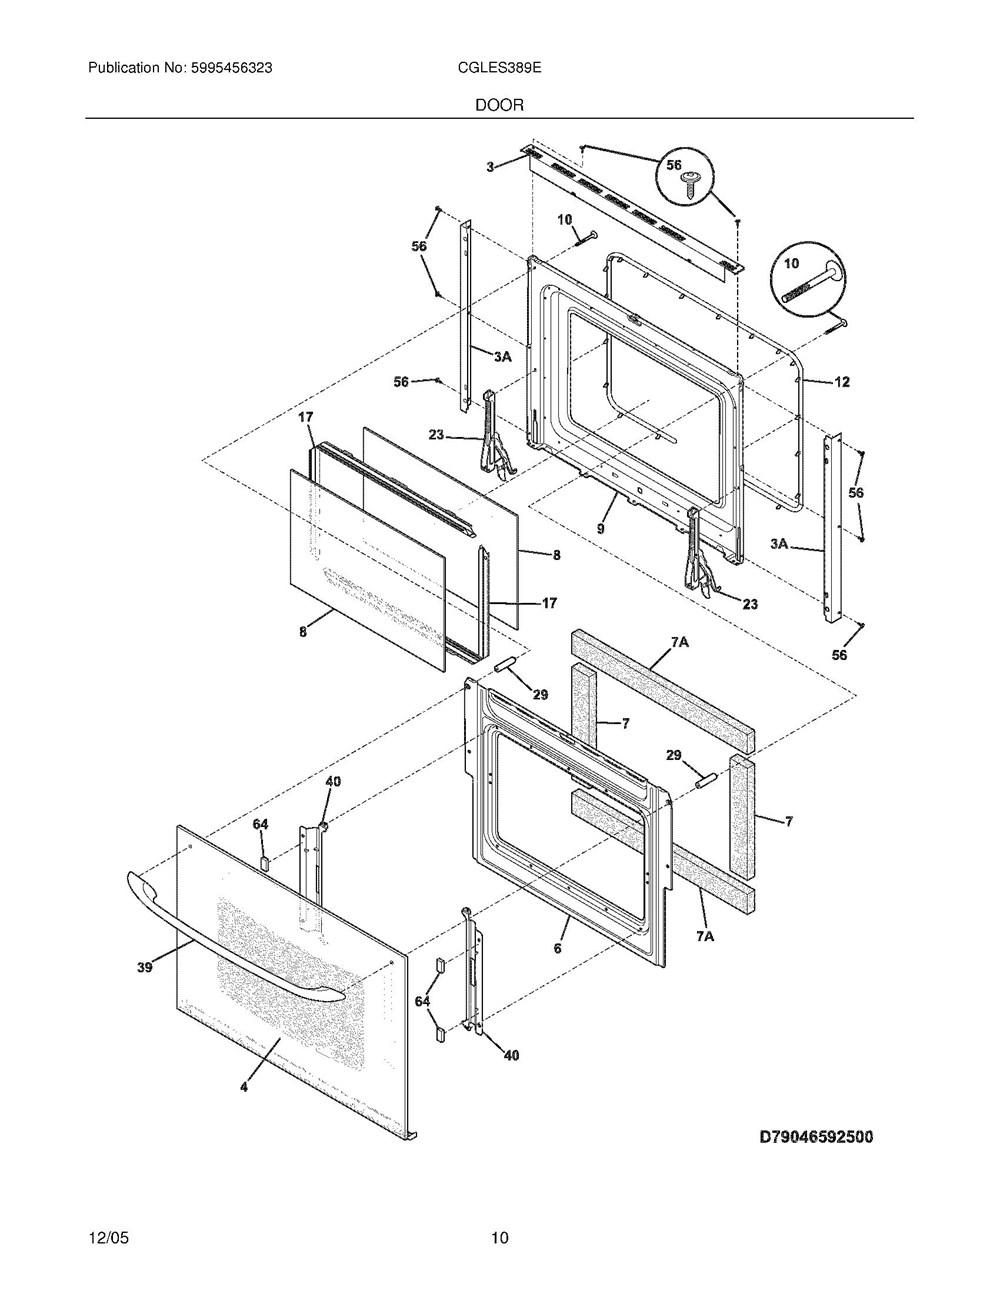 Rcwilley Salt Lake City Utah 801 461 3900 07top Drawer 09door 01cover 10wiring Schematic 11wiring Diagram